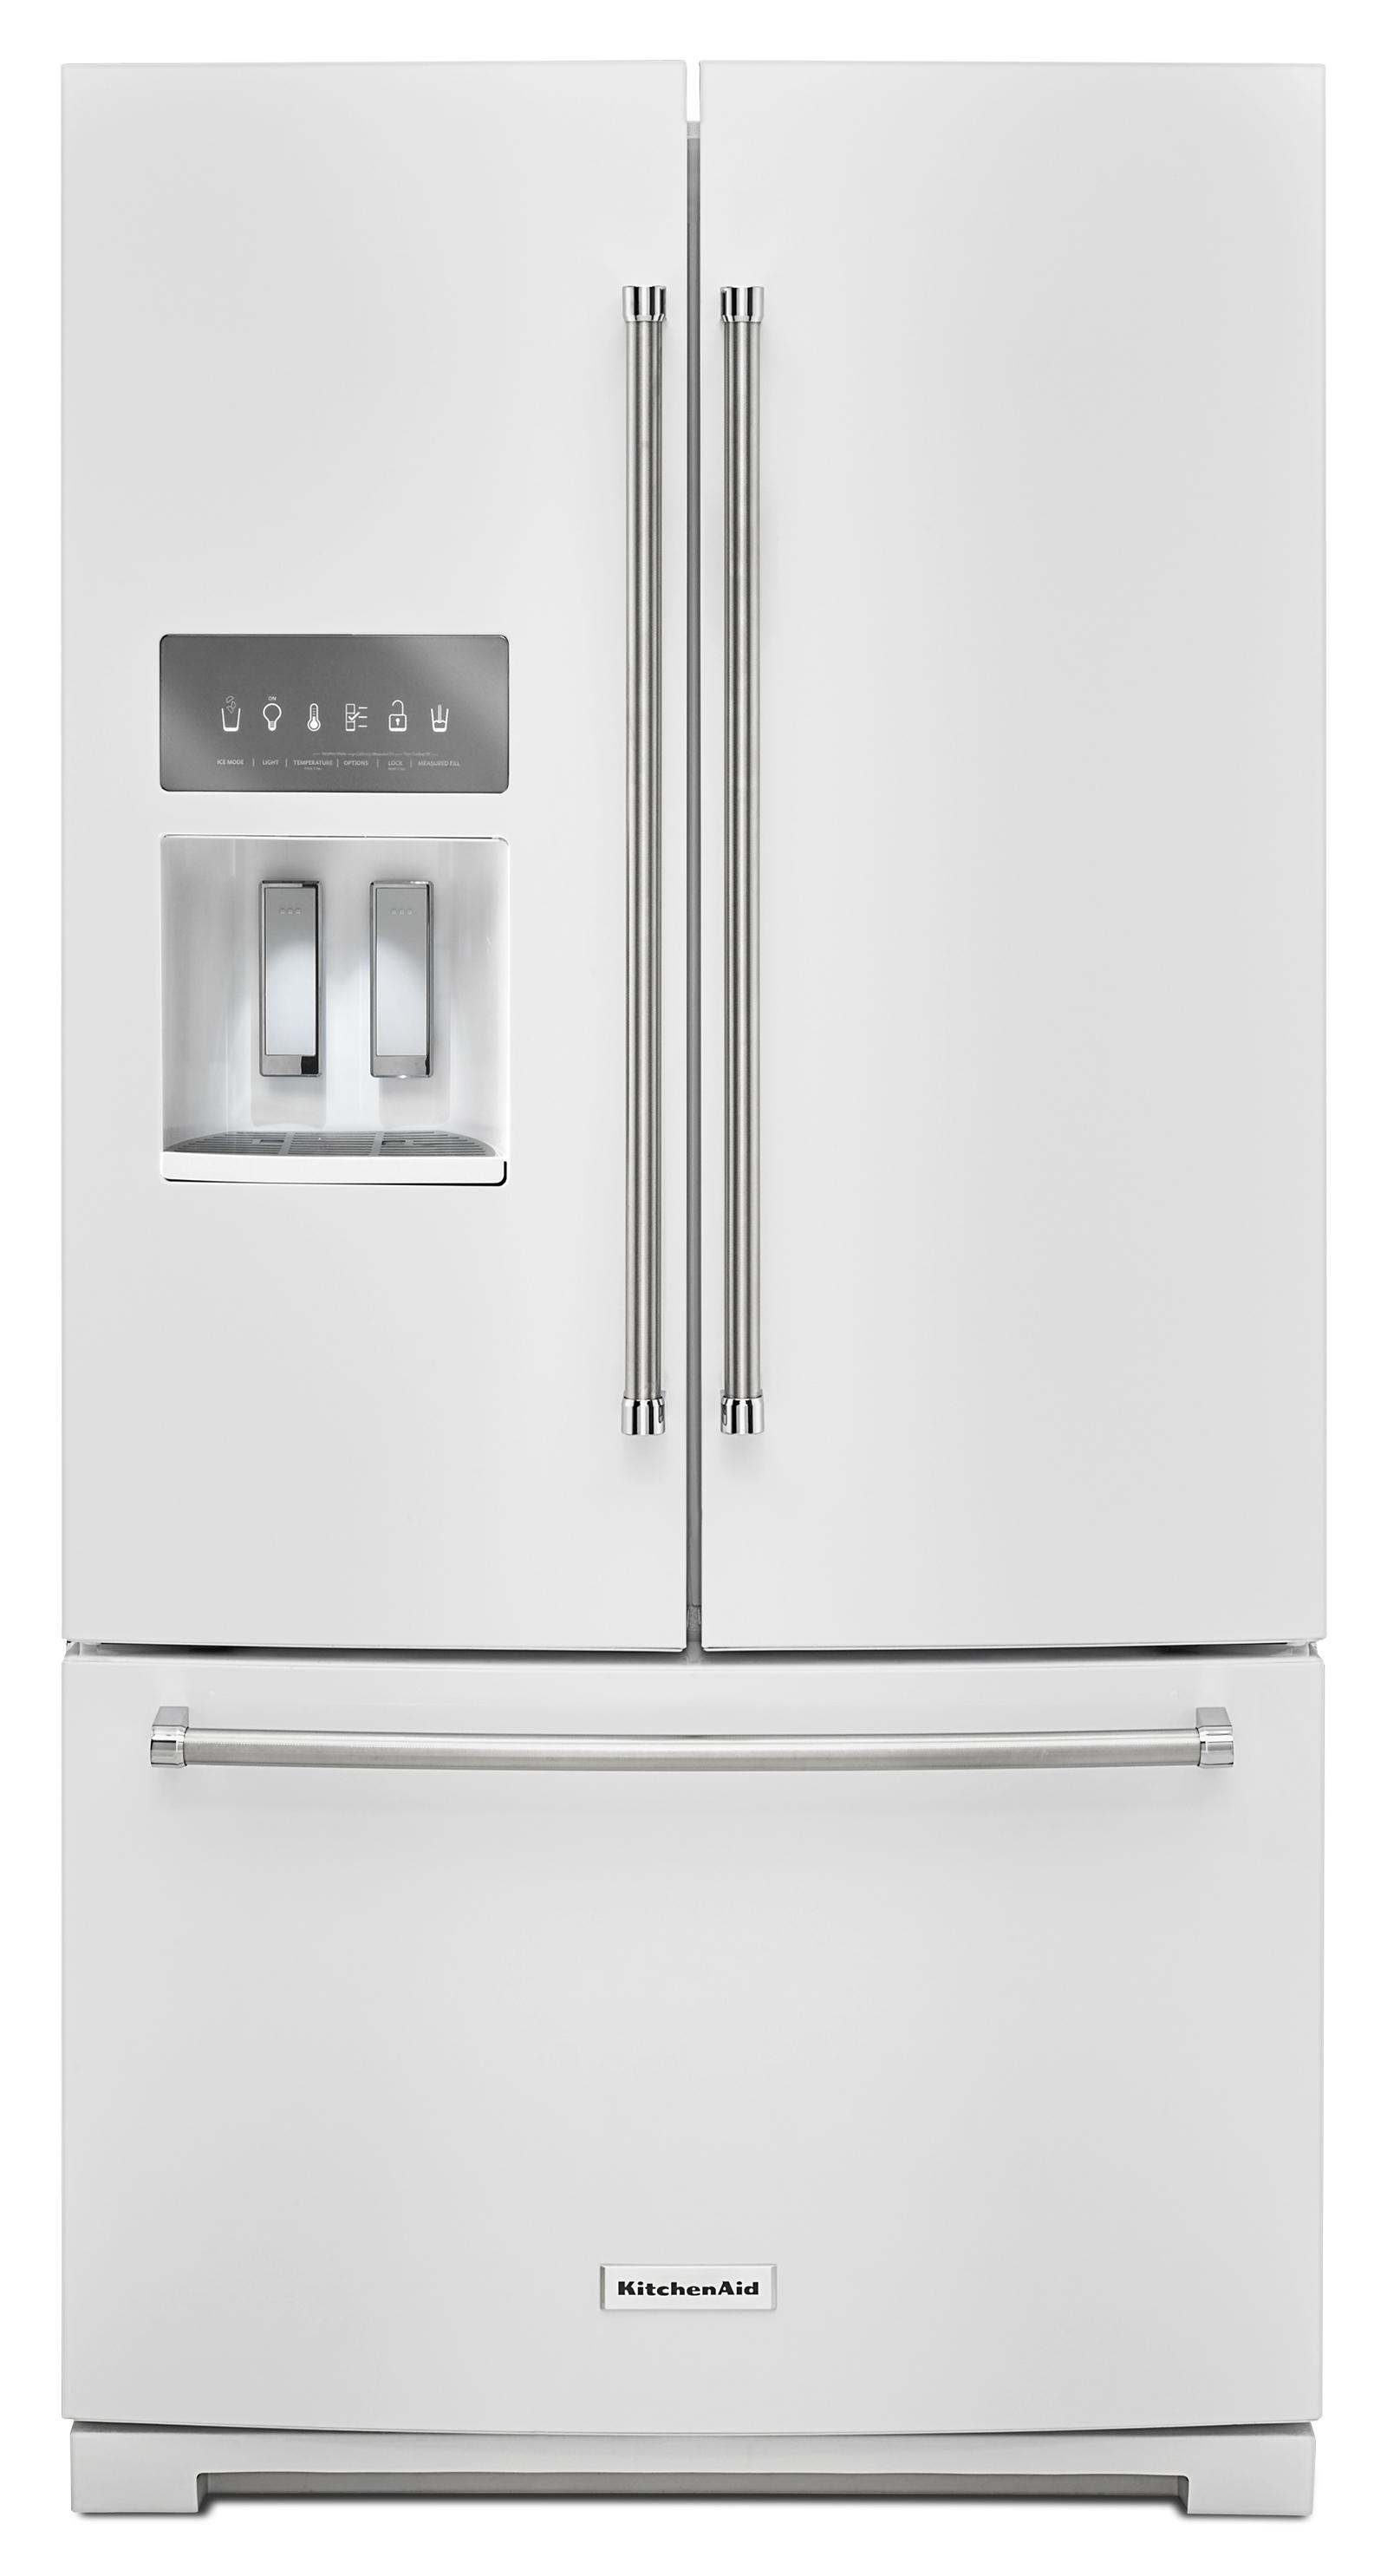 "KitchenAid 26.8 cu. ft. 36"" Width Standard Depth French Door Refrigerator - White PartNumber: 04608501000P KsnValue: 04608501000 MfgPartNumber: KRFF507EWH"